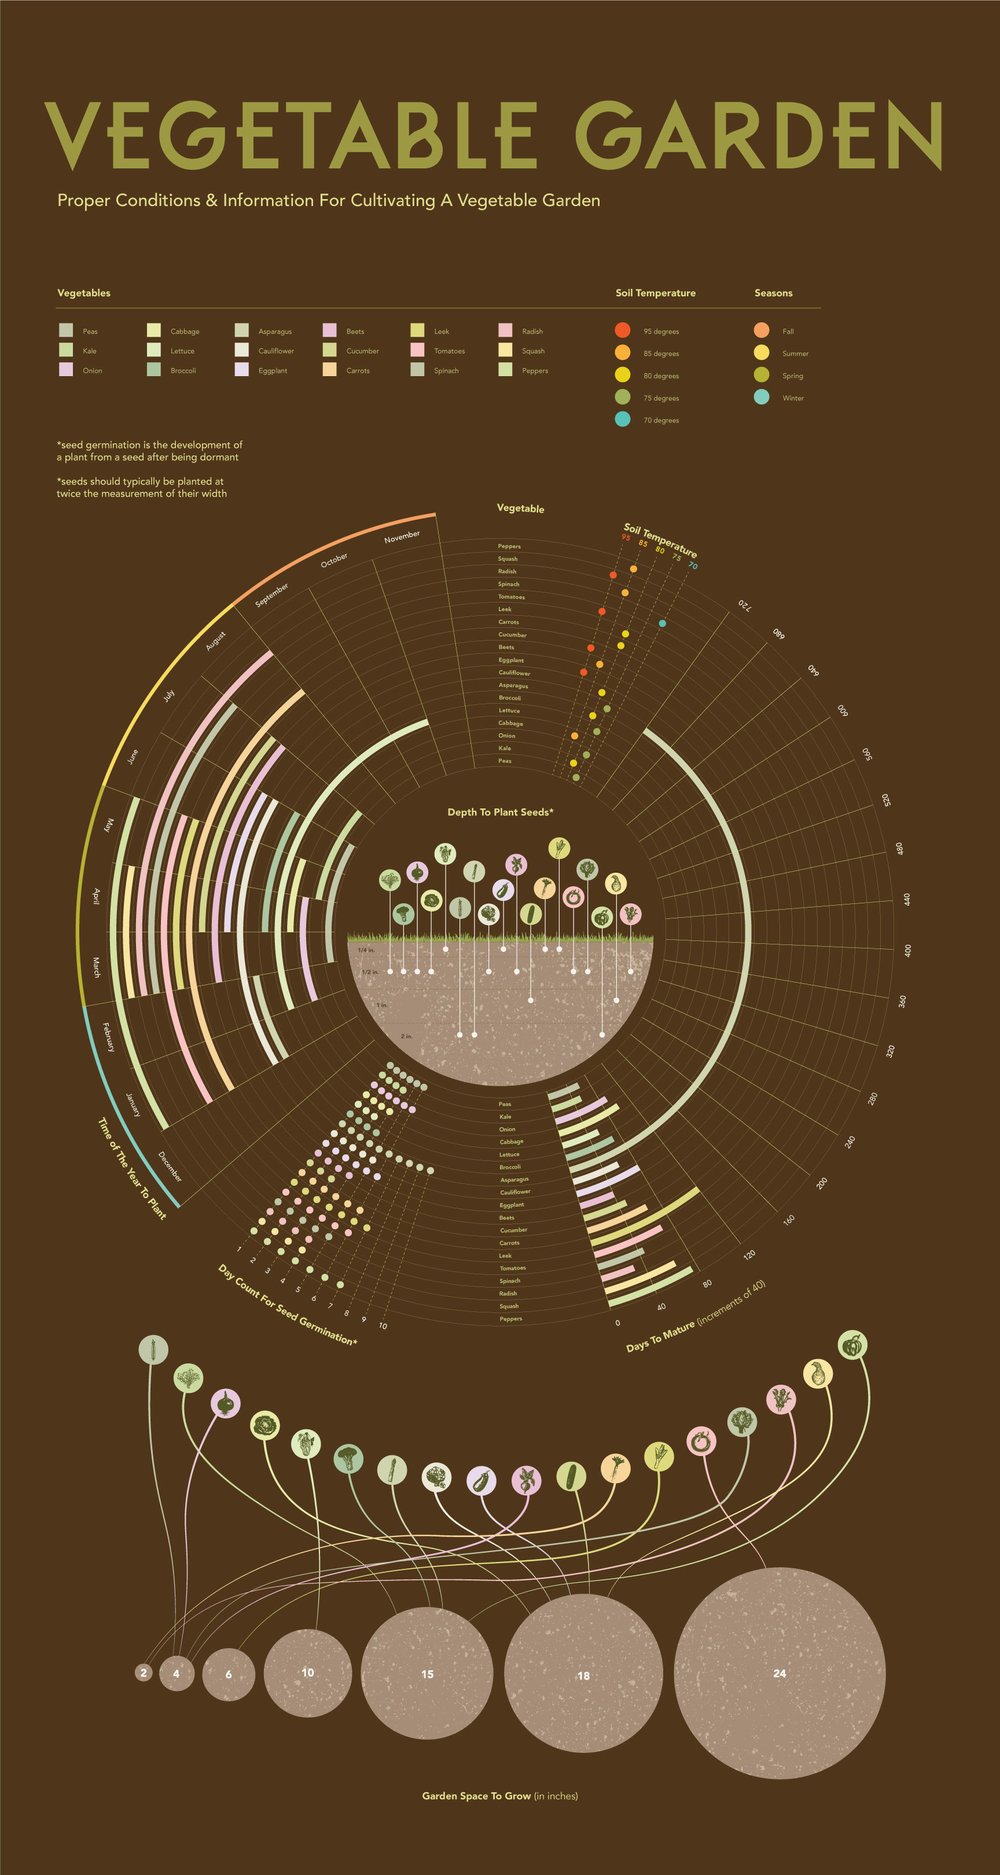 gardening-info-design-1.jpg